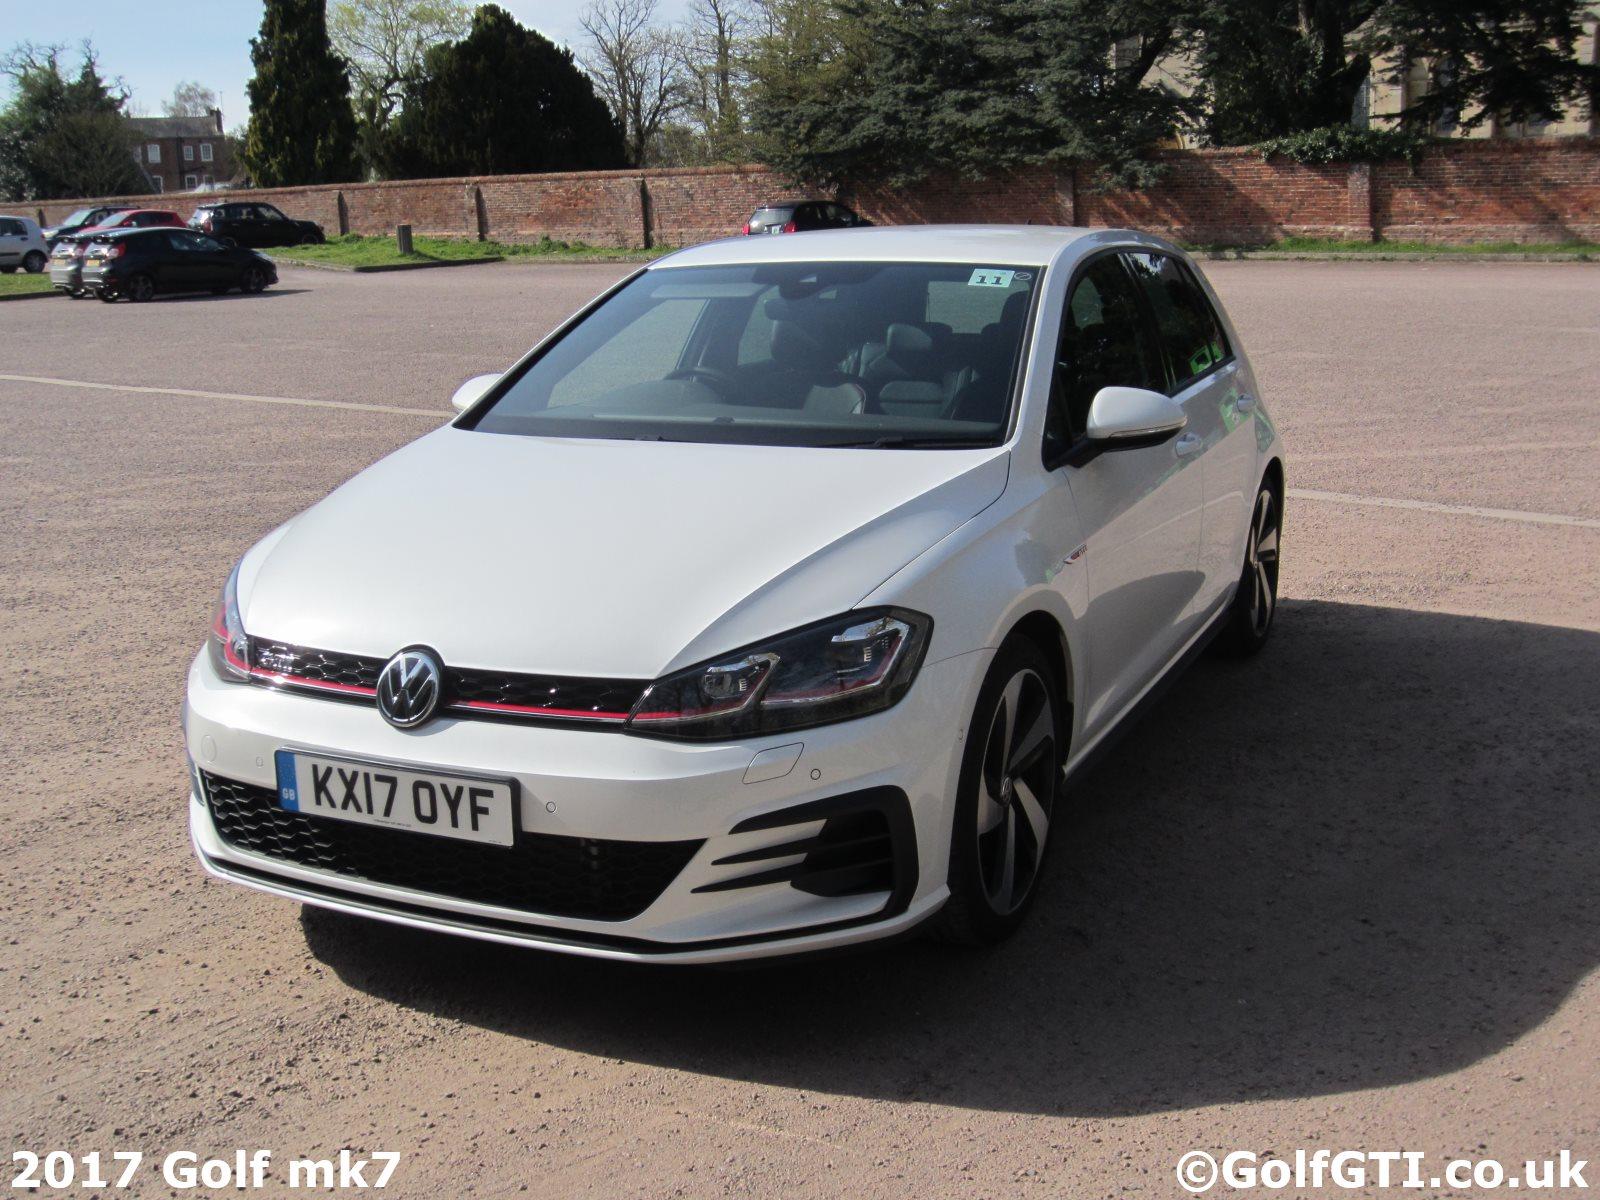 GolfGTI co uk - Mk7 Golf 2017 updates